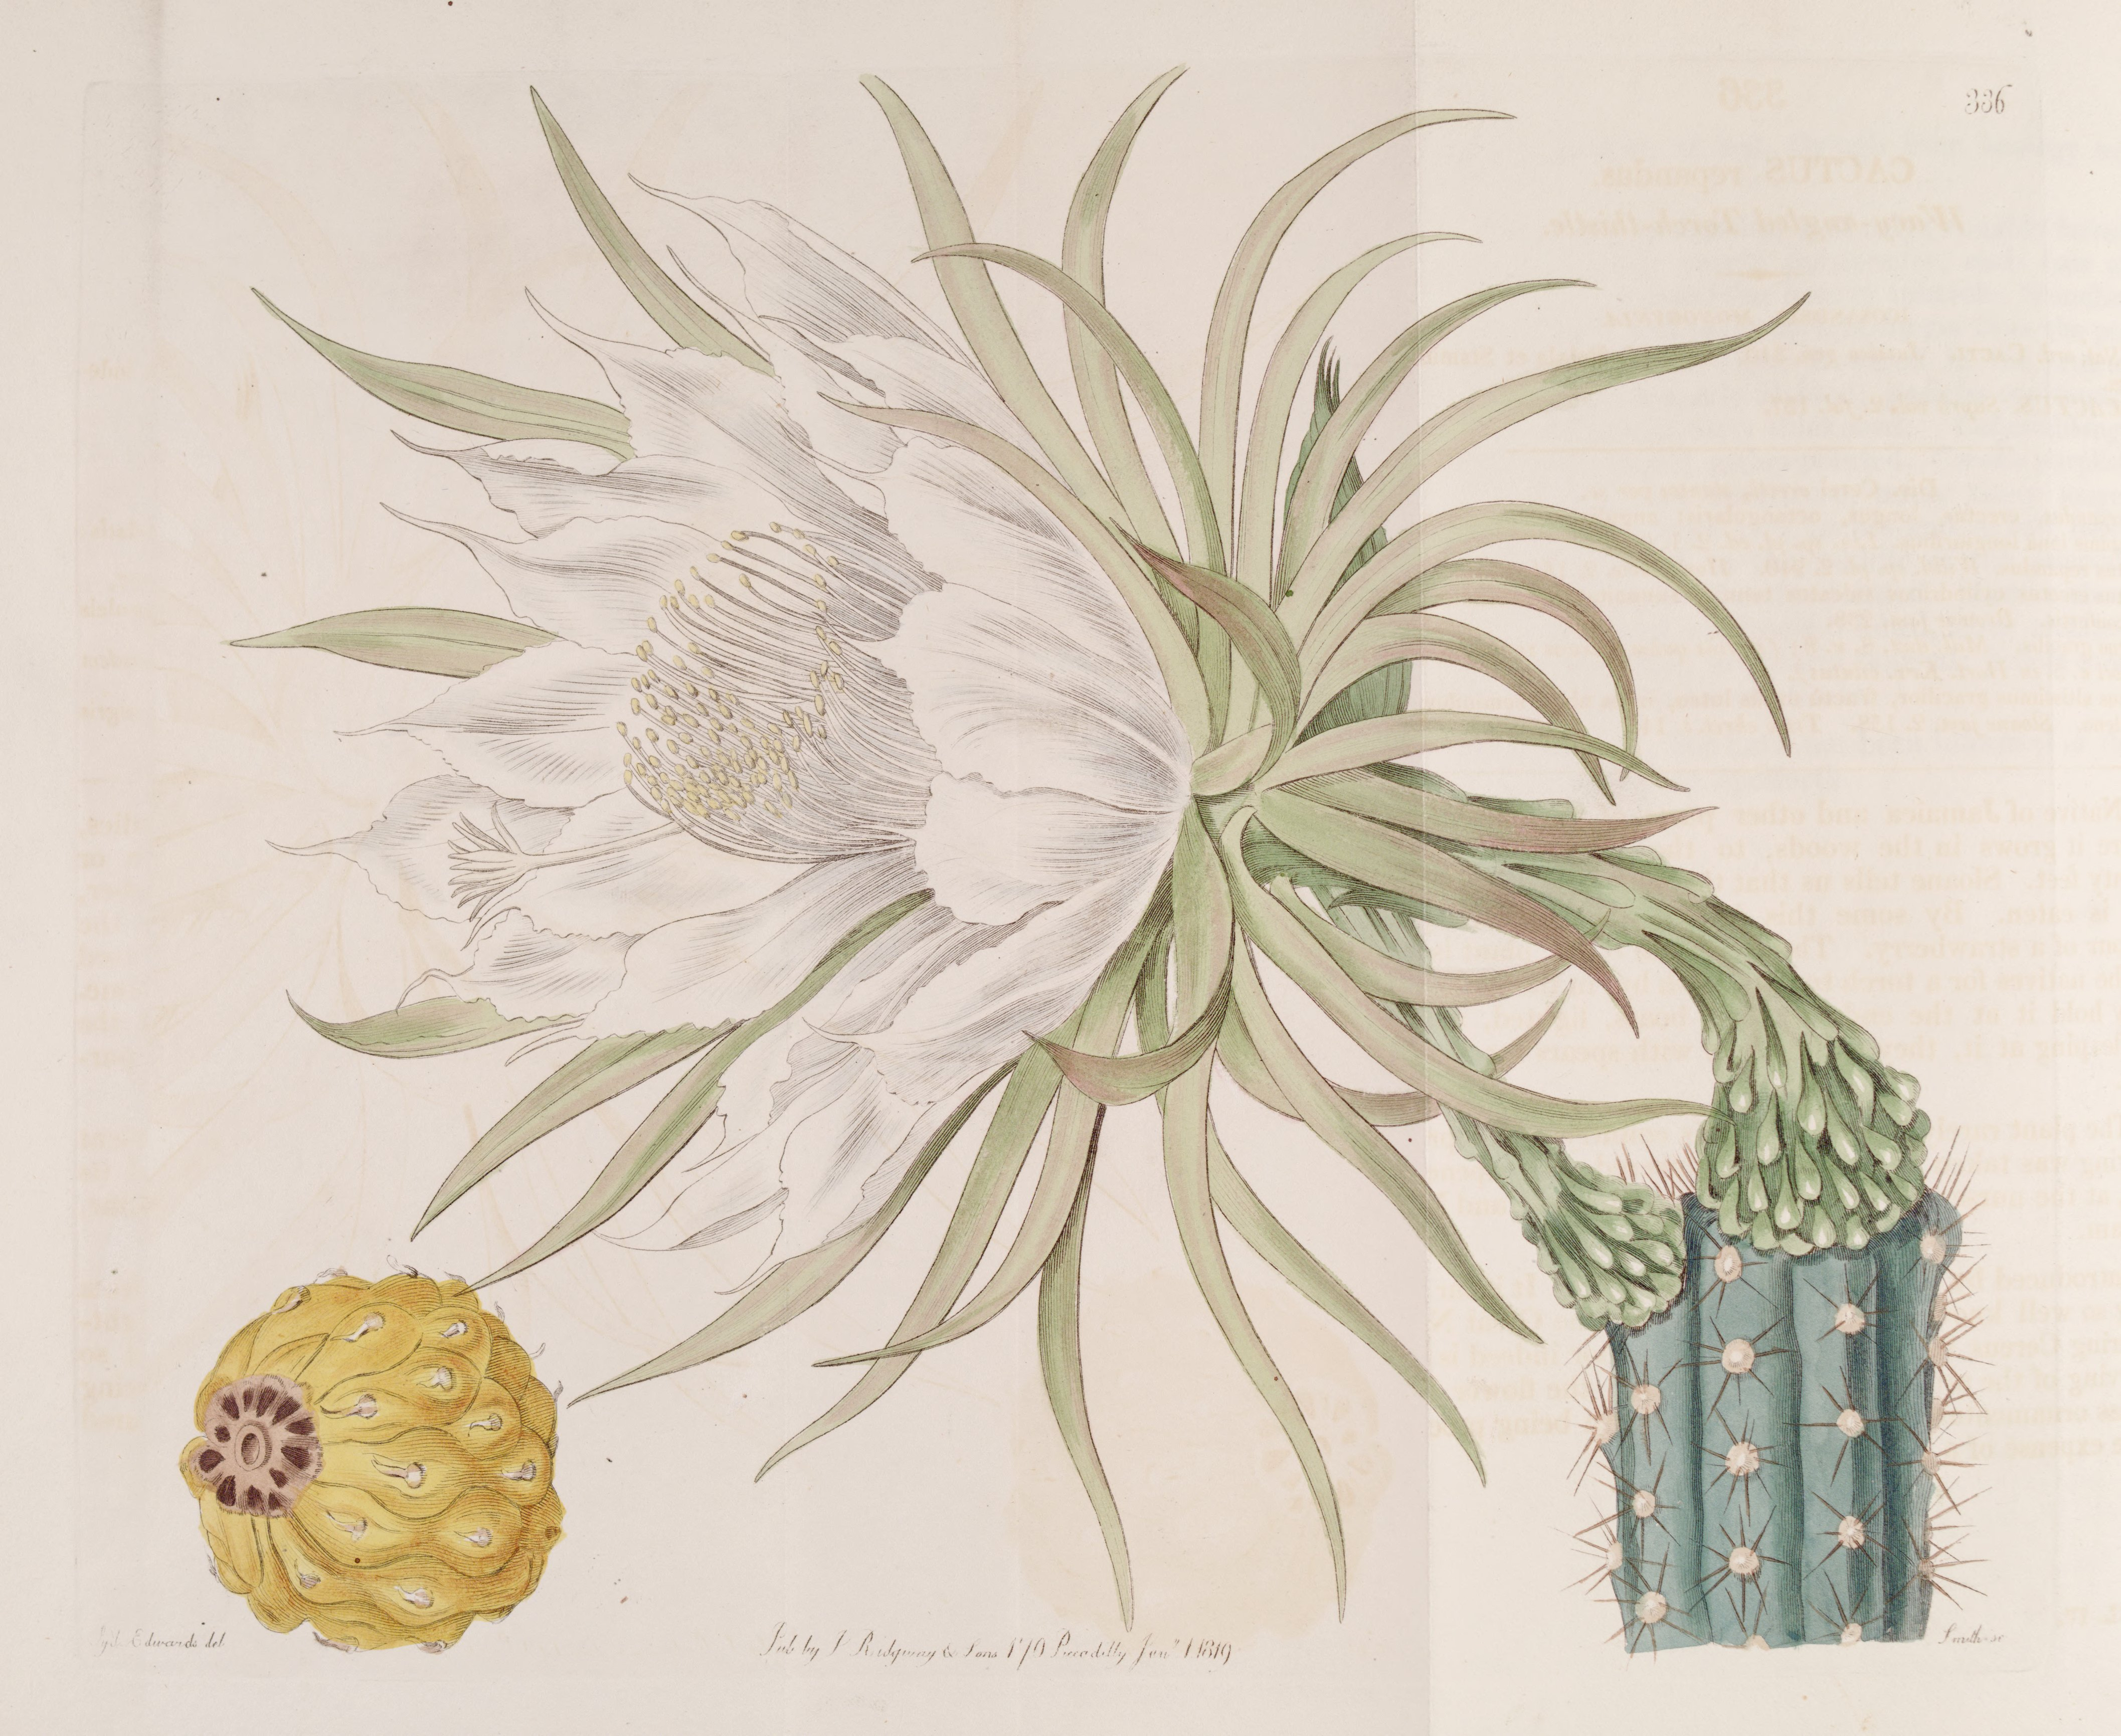 Harrisia gracilis (Cereus repandus) Bot. Reg. 4. 336. 1818.jpg © Edwards